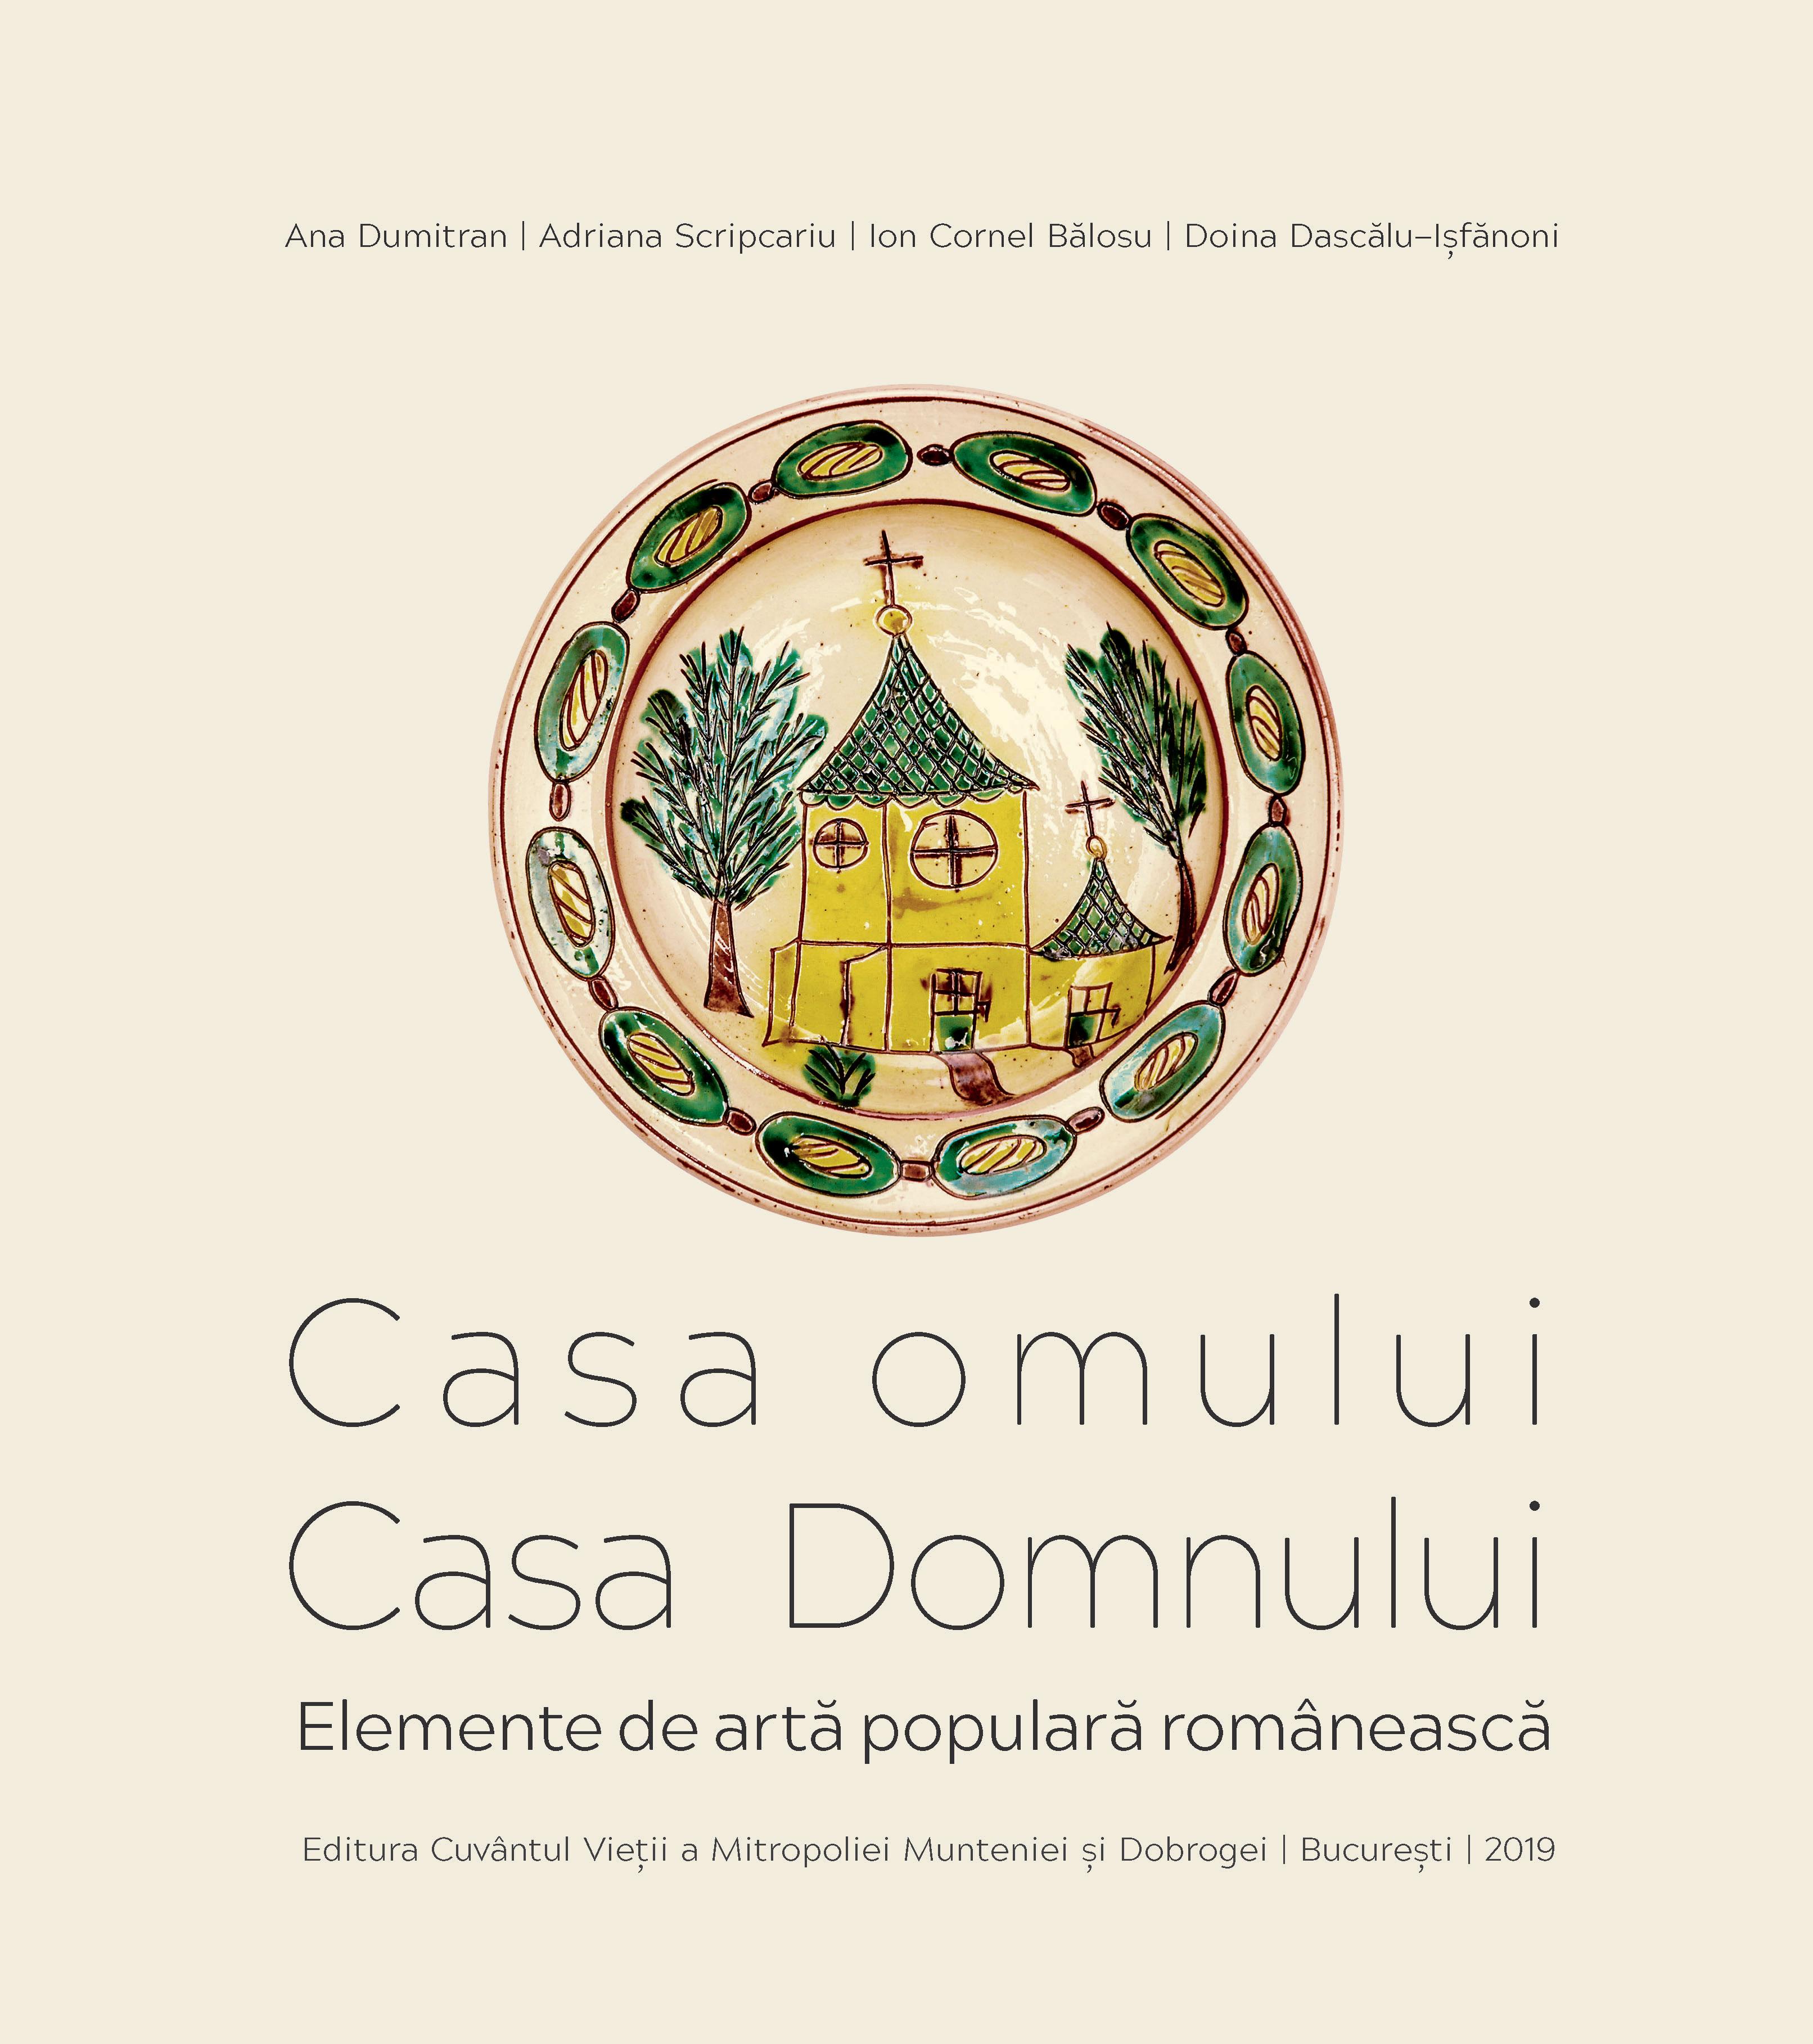 Ana DUMITRAN, Adriana SCRIPCARIU, Ion Cornel BALOSU, Doina DASCALU-ISFANONI | Casa omului, Casa Domnului.